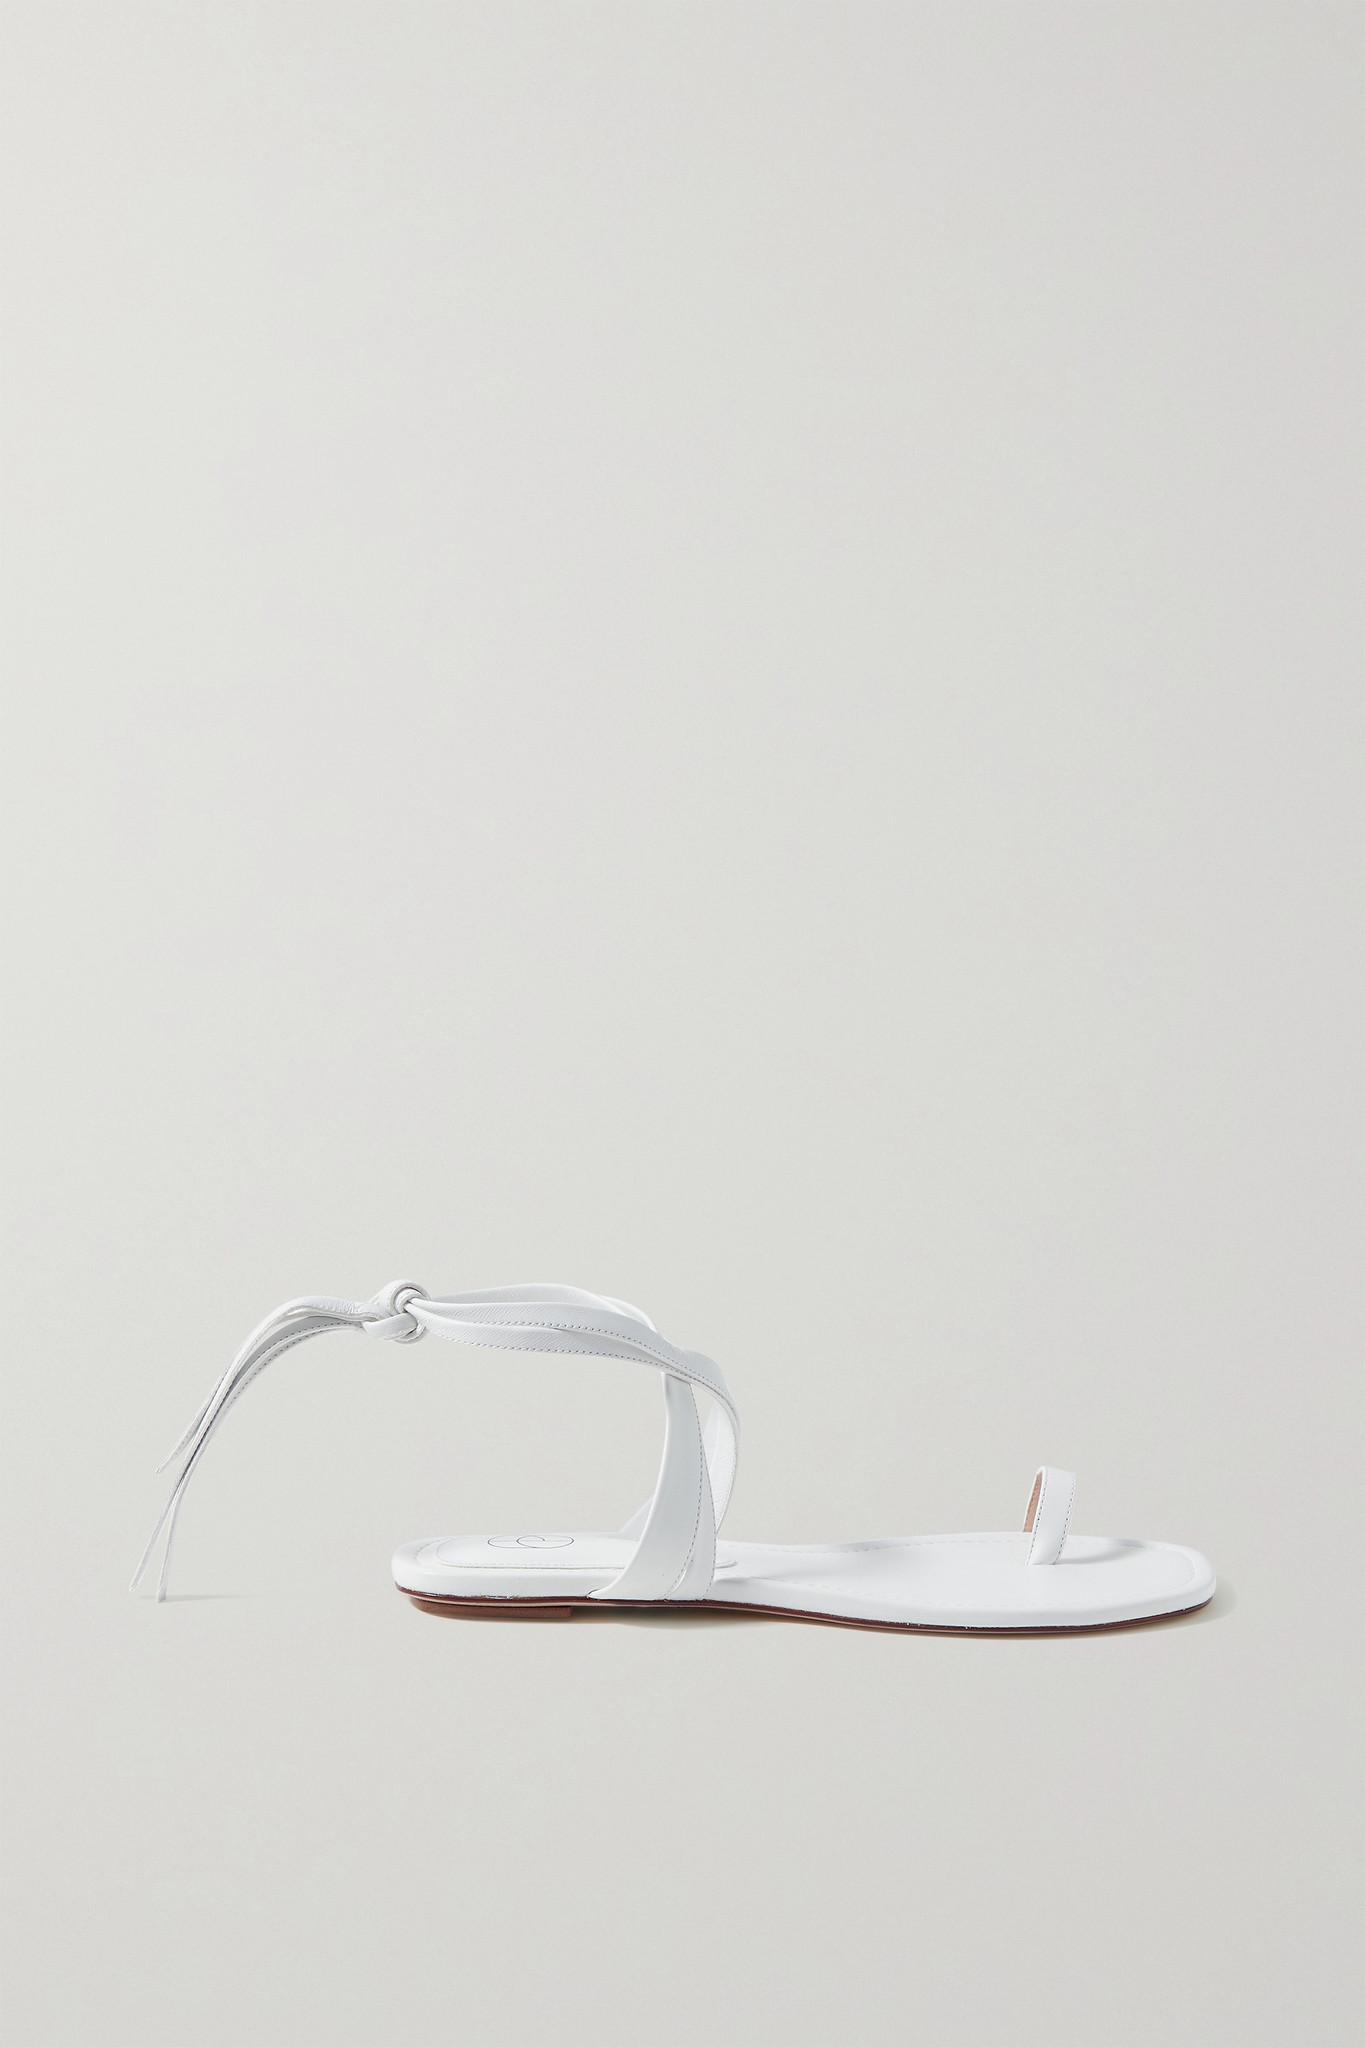 PORTE & PAIRE - 皮革凉鞋 - 白色 - IT35.5